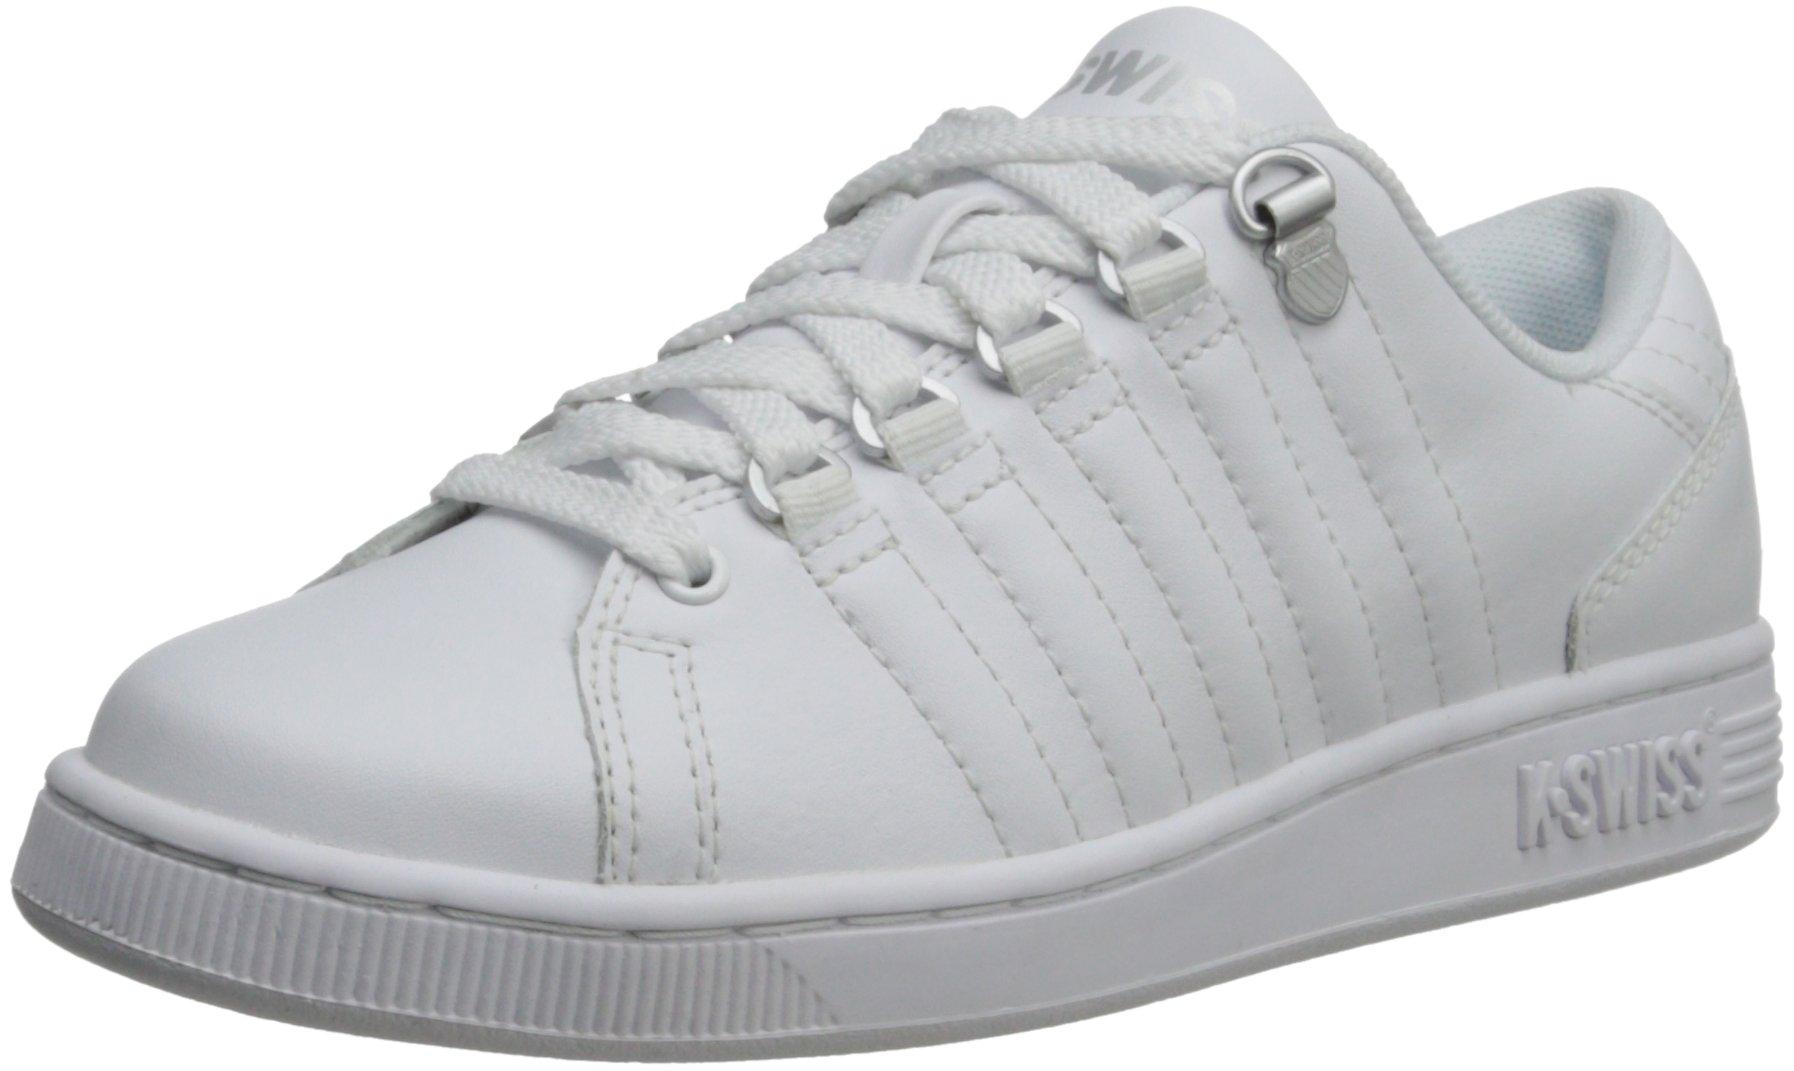 K-Swiss 8110 Lozan Sneaker (Big Kid),White/White/Silver,3.5 M US Big Kid by K-Swiss (Image #1)